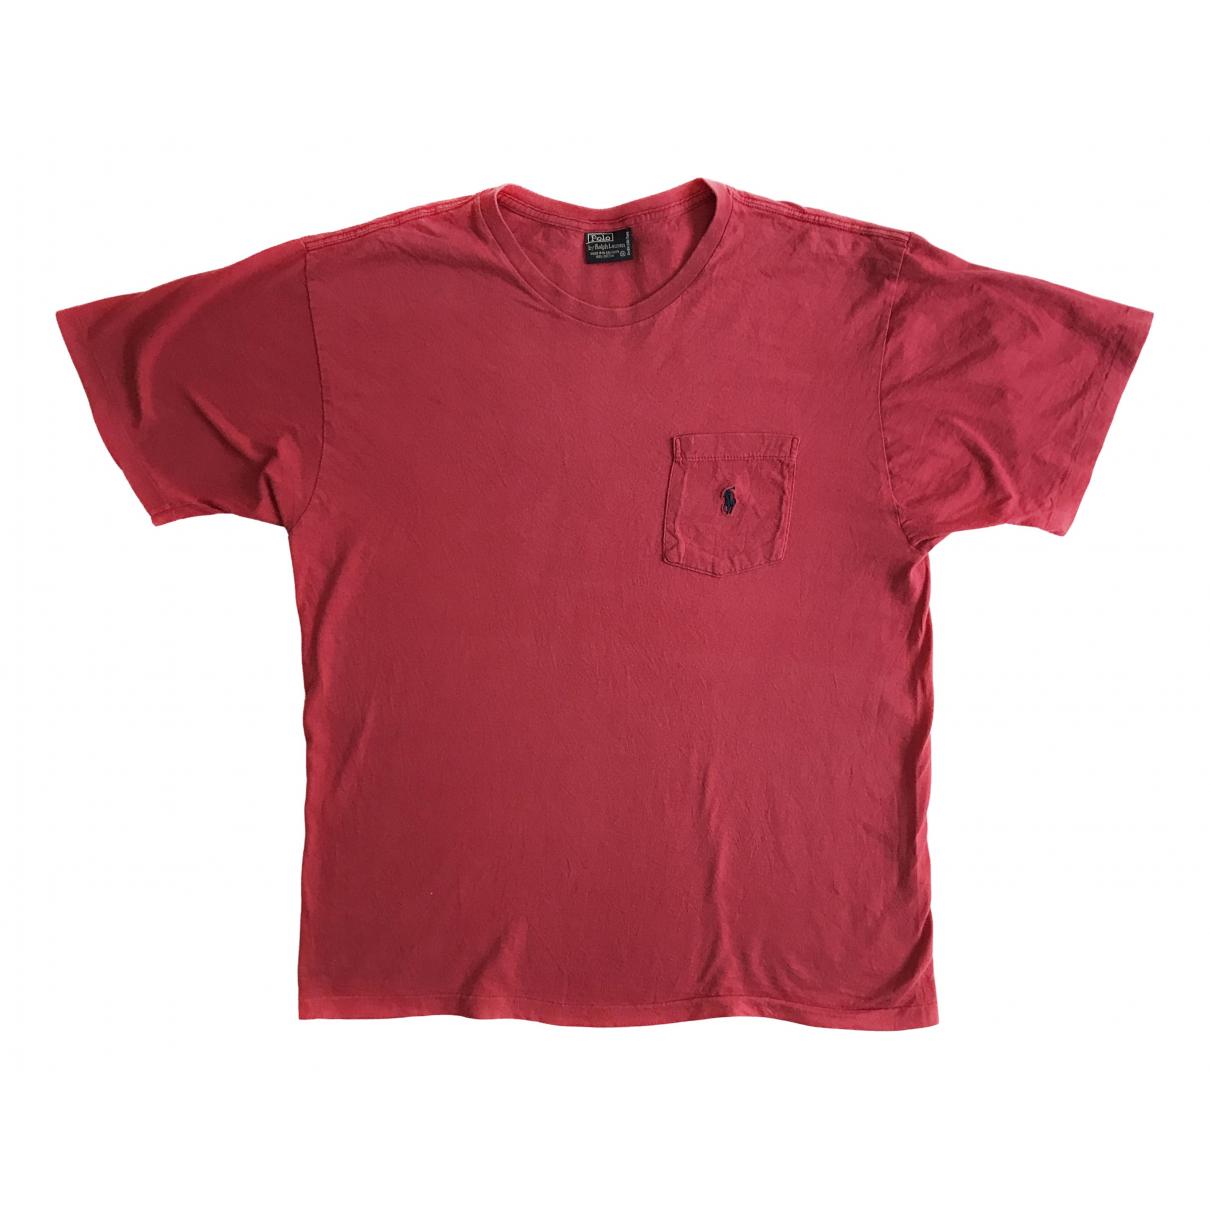 Polo Ralph Lauren \N Pink Cotton T-shirts for Men M International